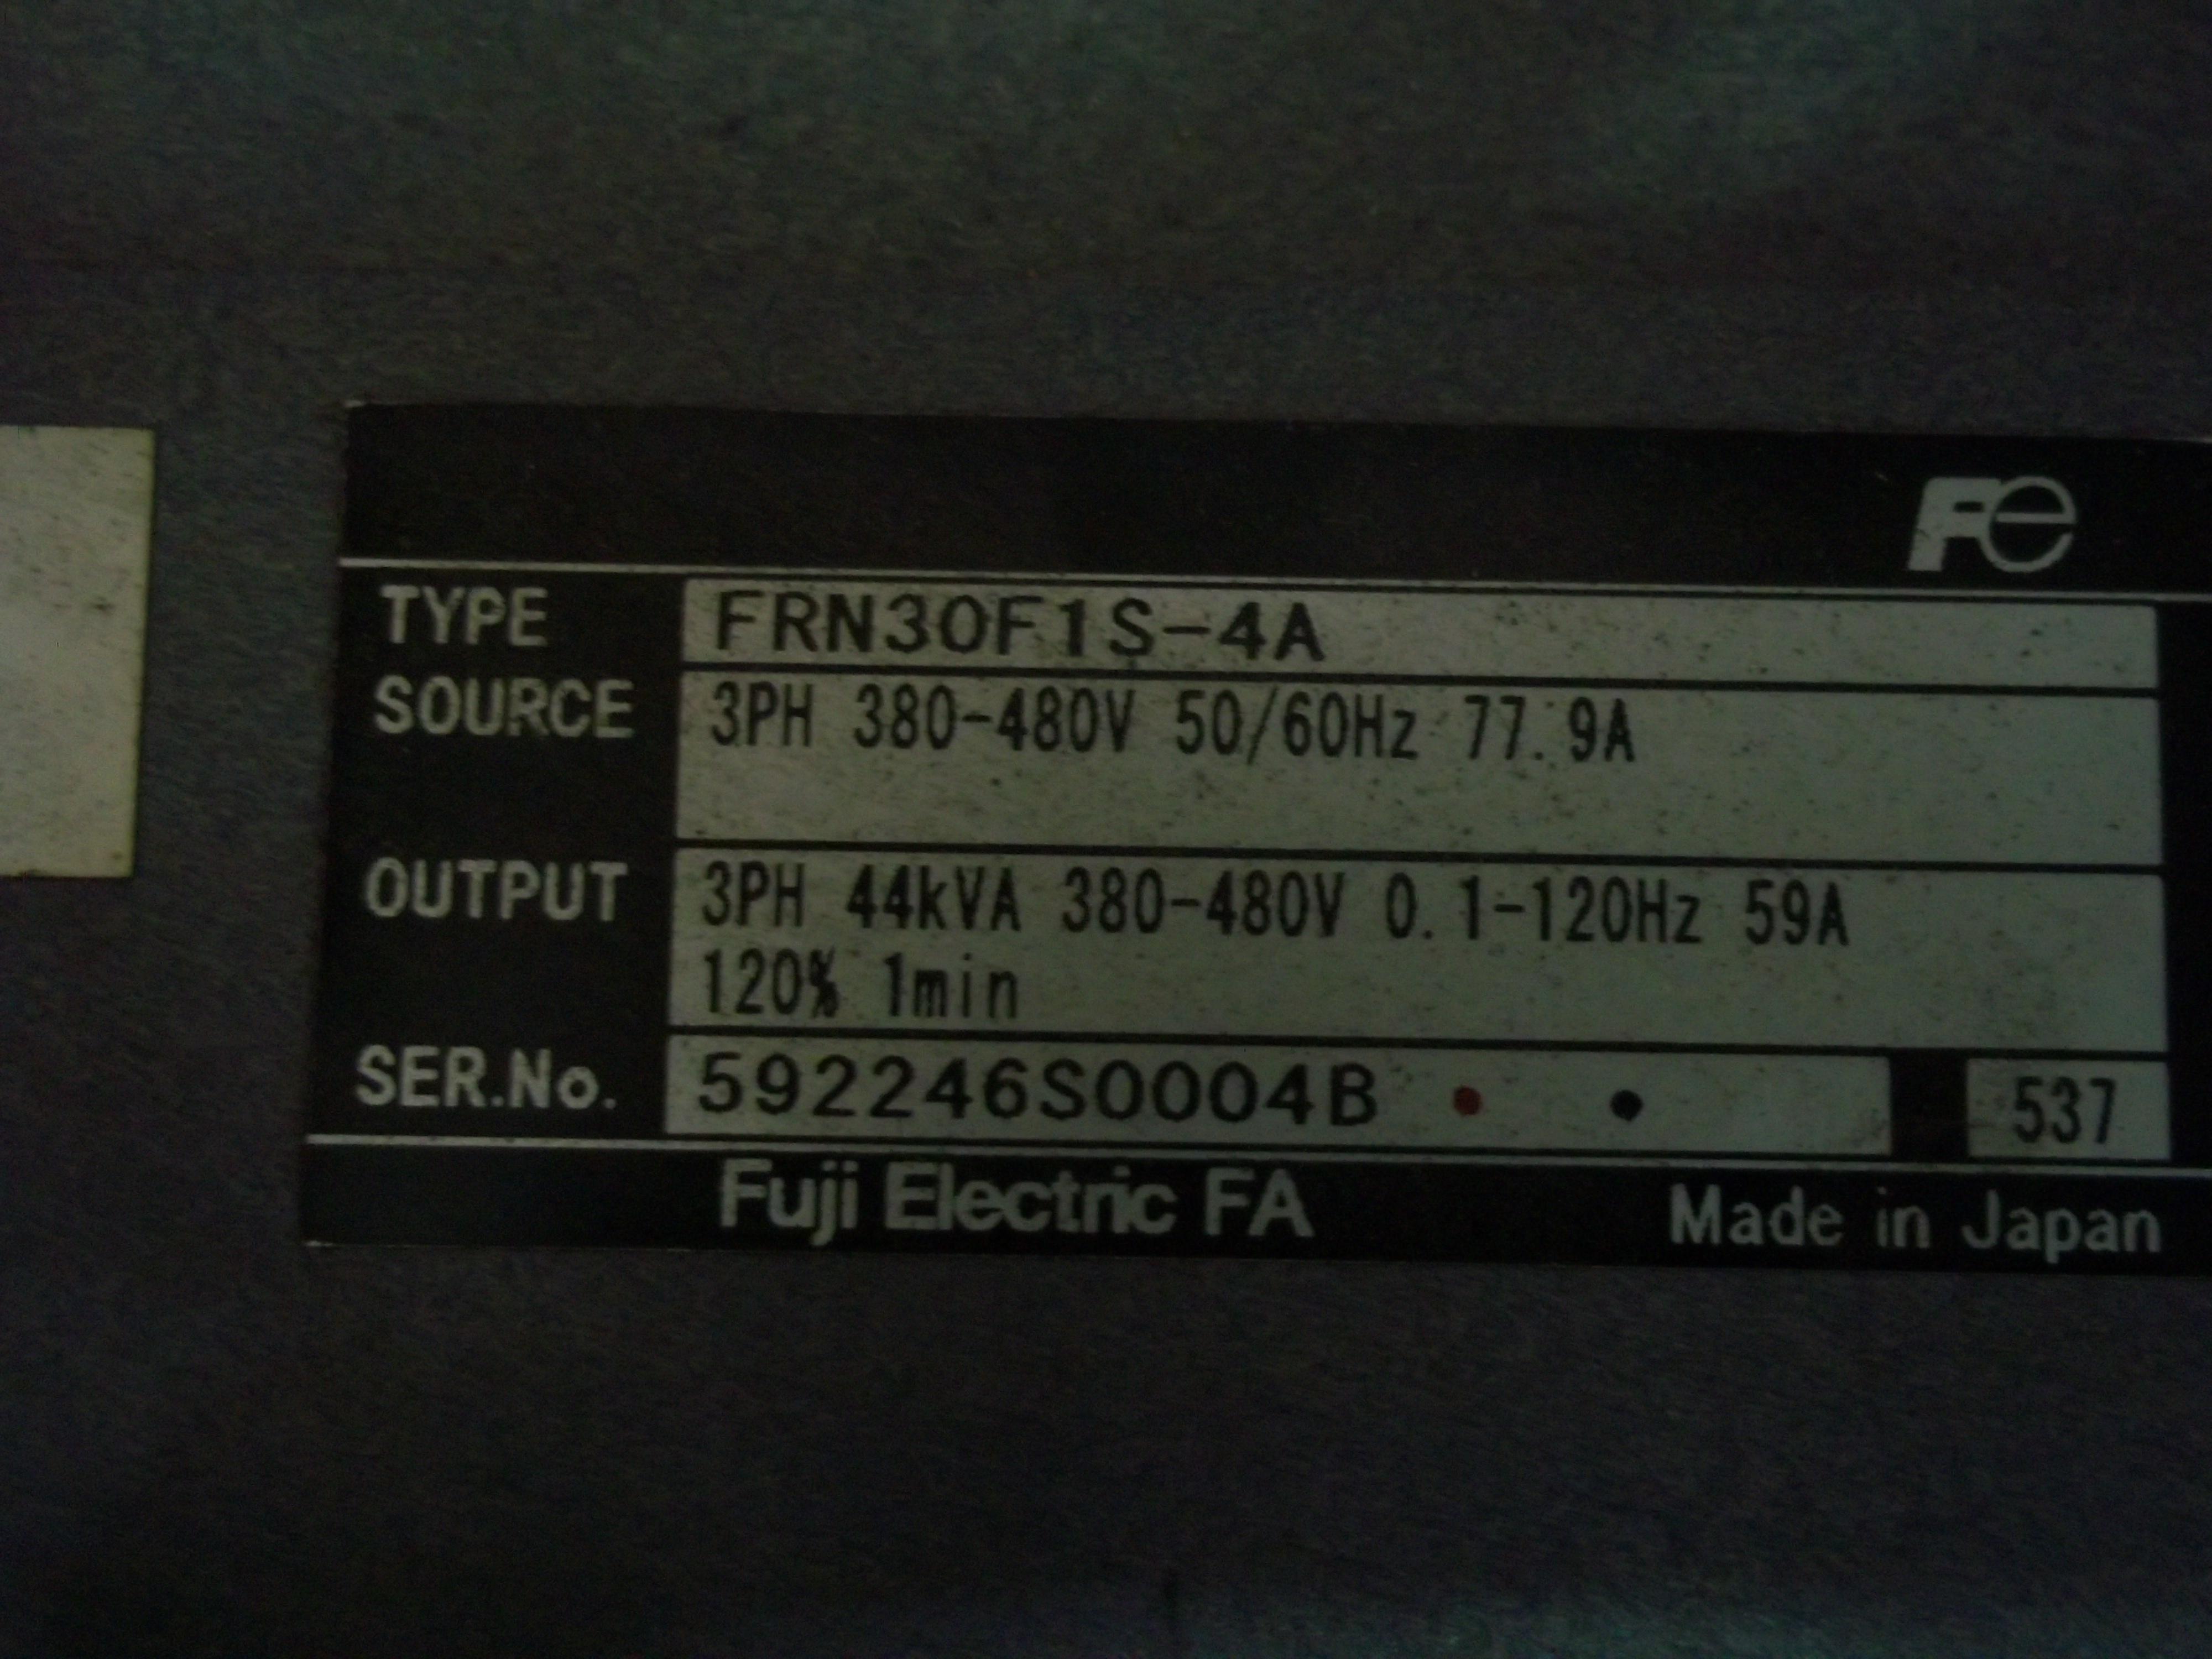 Repair FRN30F1S-4A FUJI  FUJI FRENIC in Malaysia, Singapore, Thailand, Indonesia